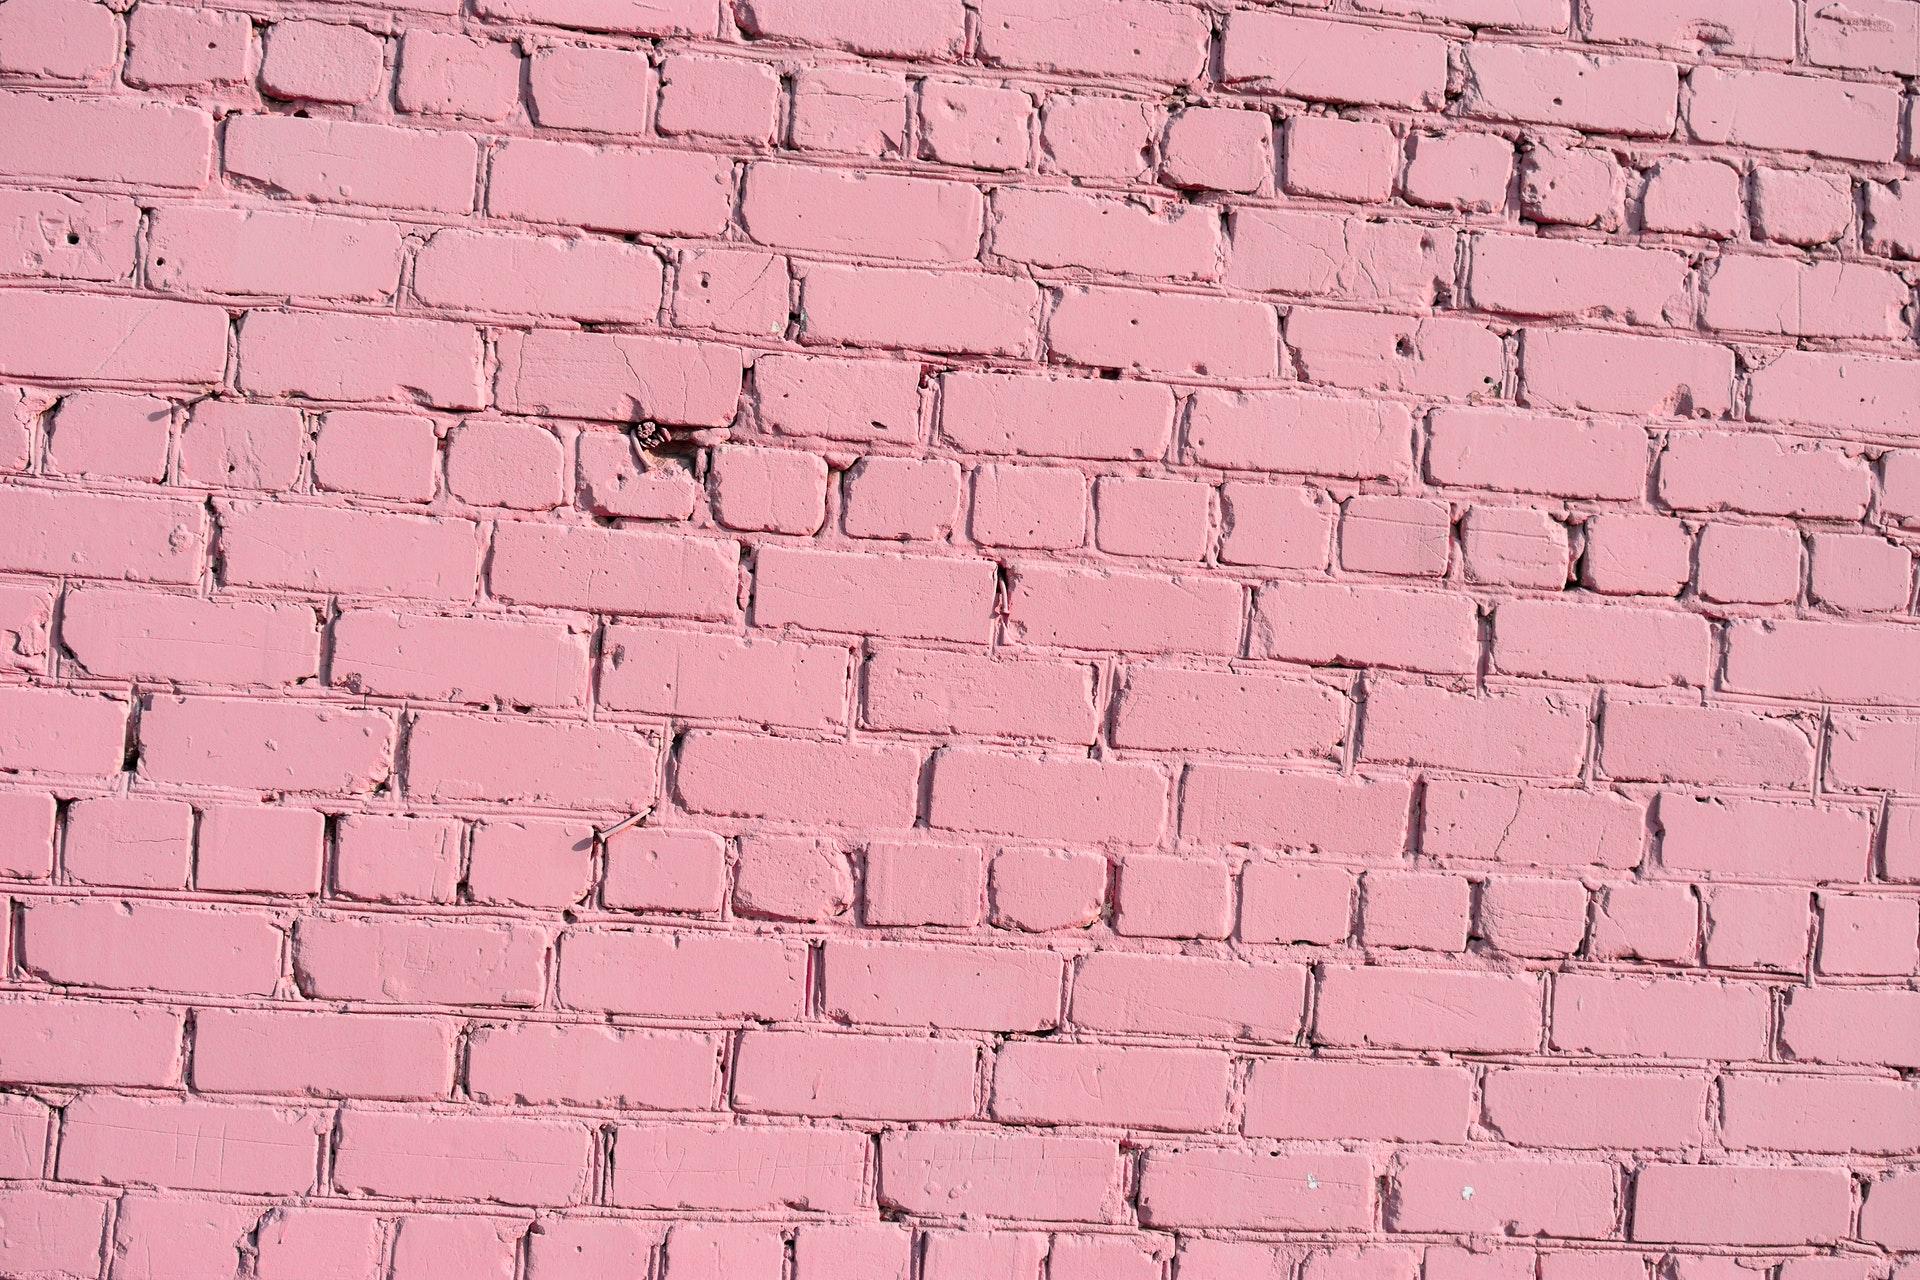 pink-texture-wall-1585710